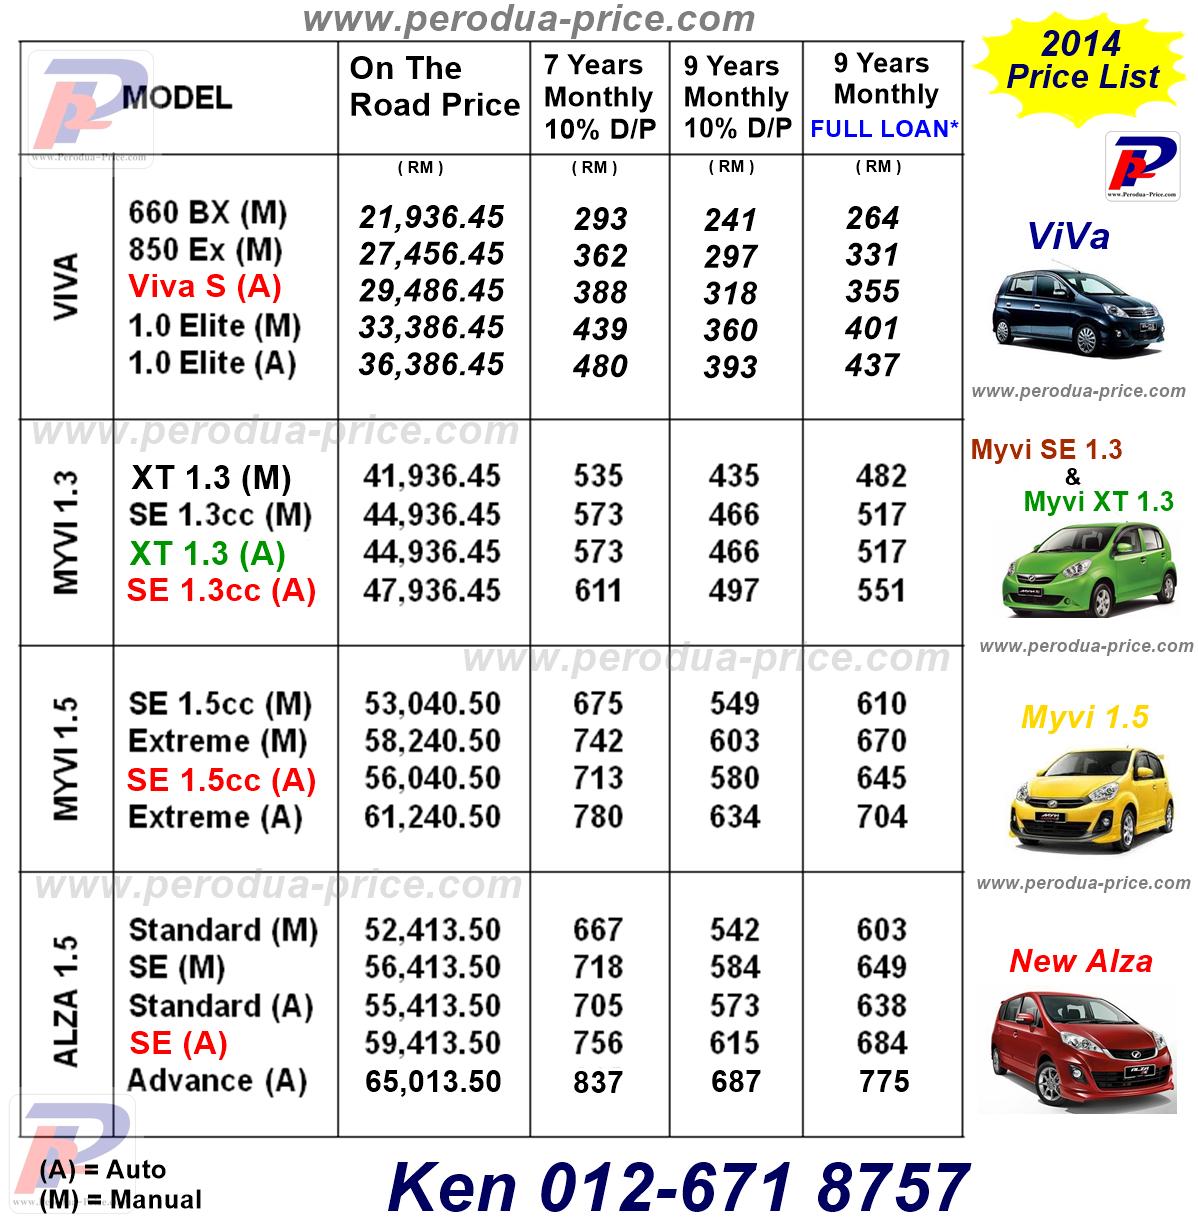 Perodua Promosi - 012 671 8757: Perodua Price List ( NEW )